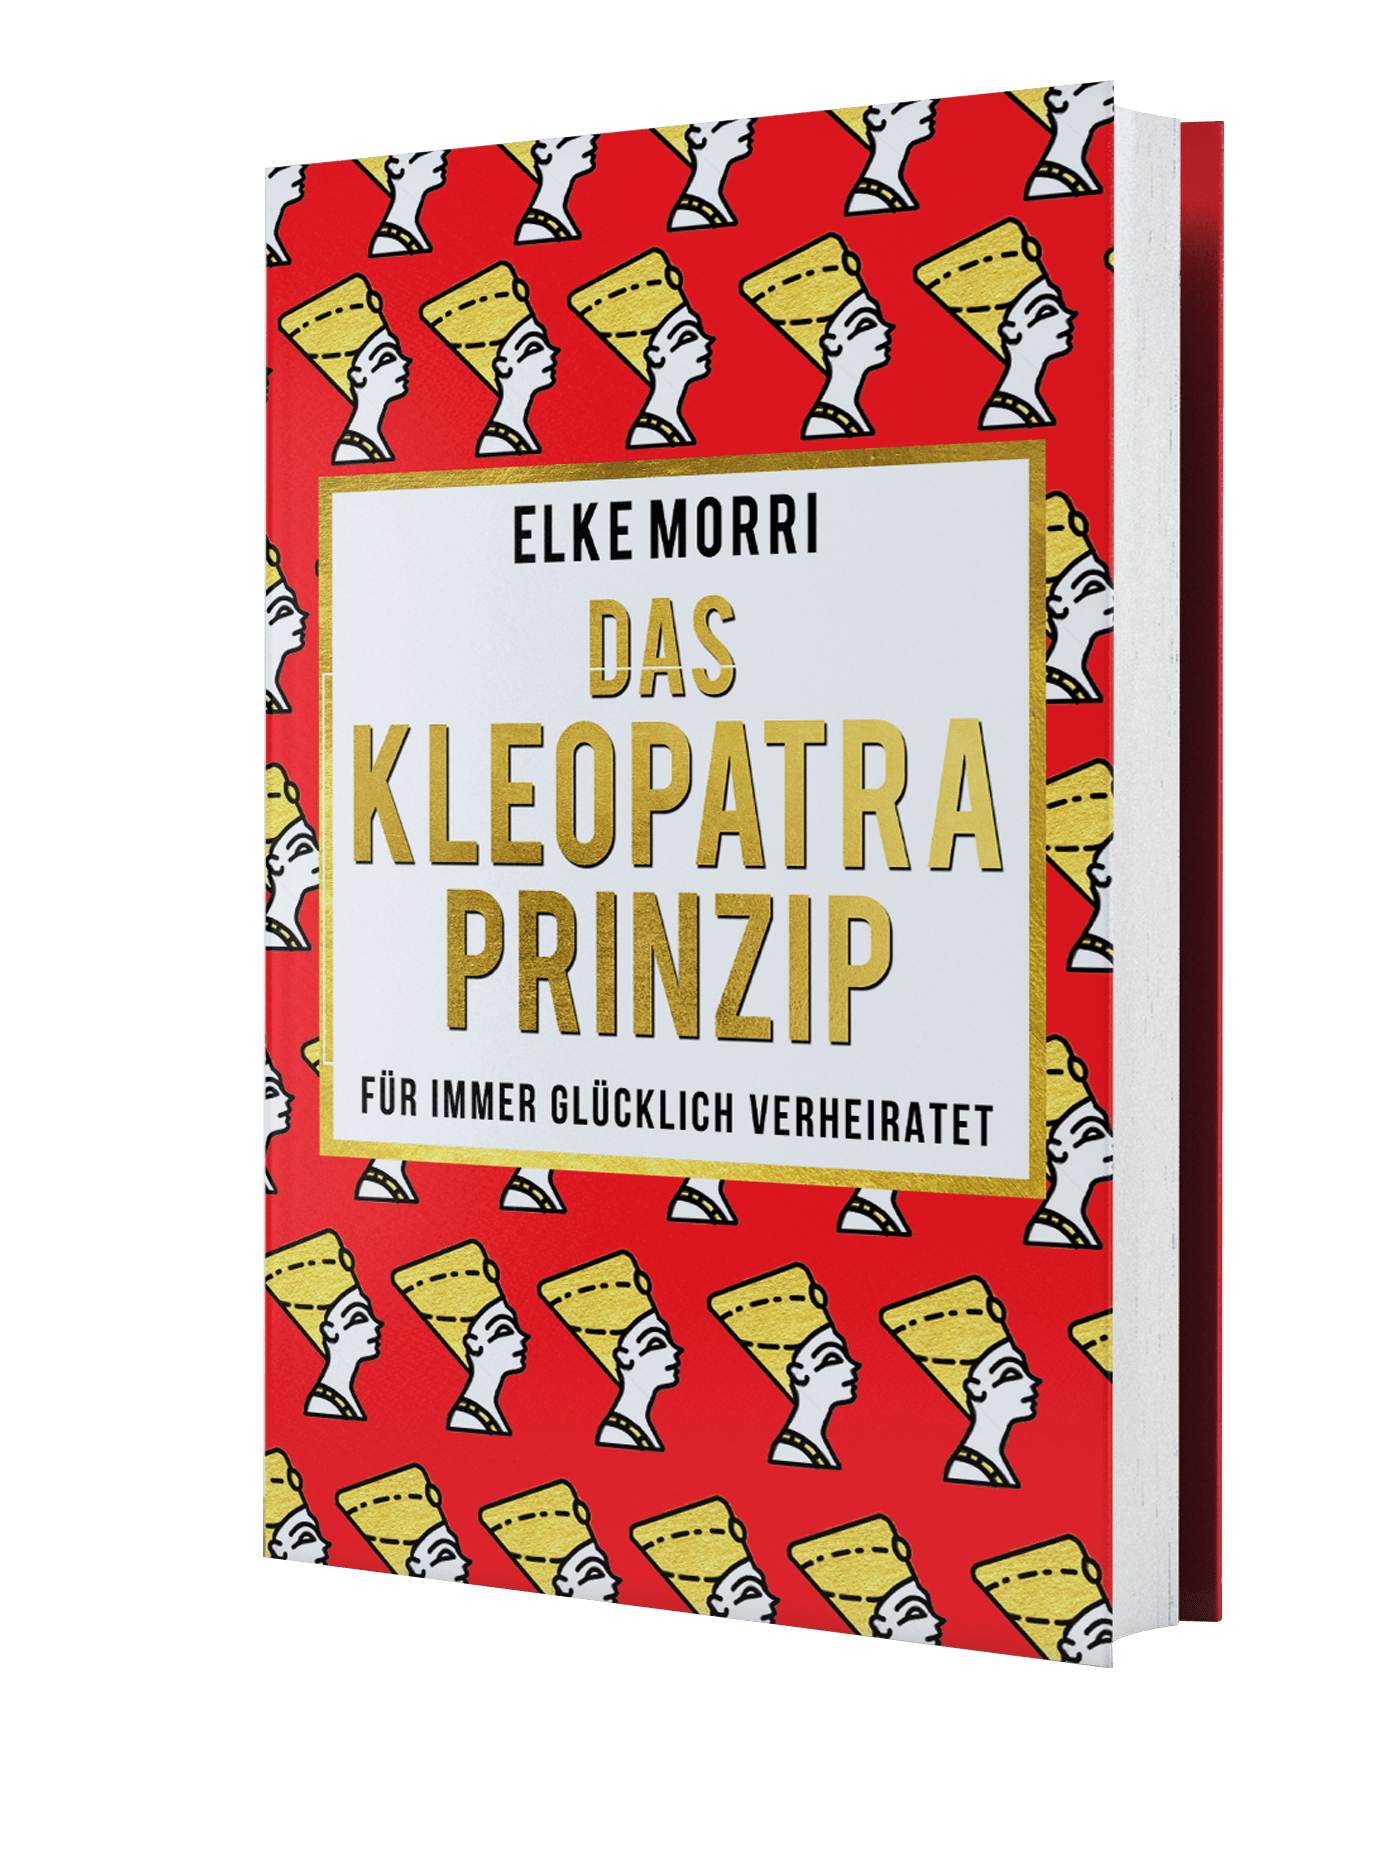 Das Kleopatraprinzip von Elke Morri